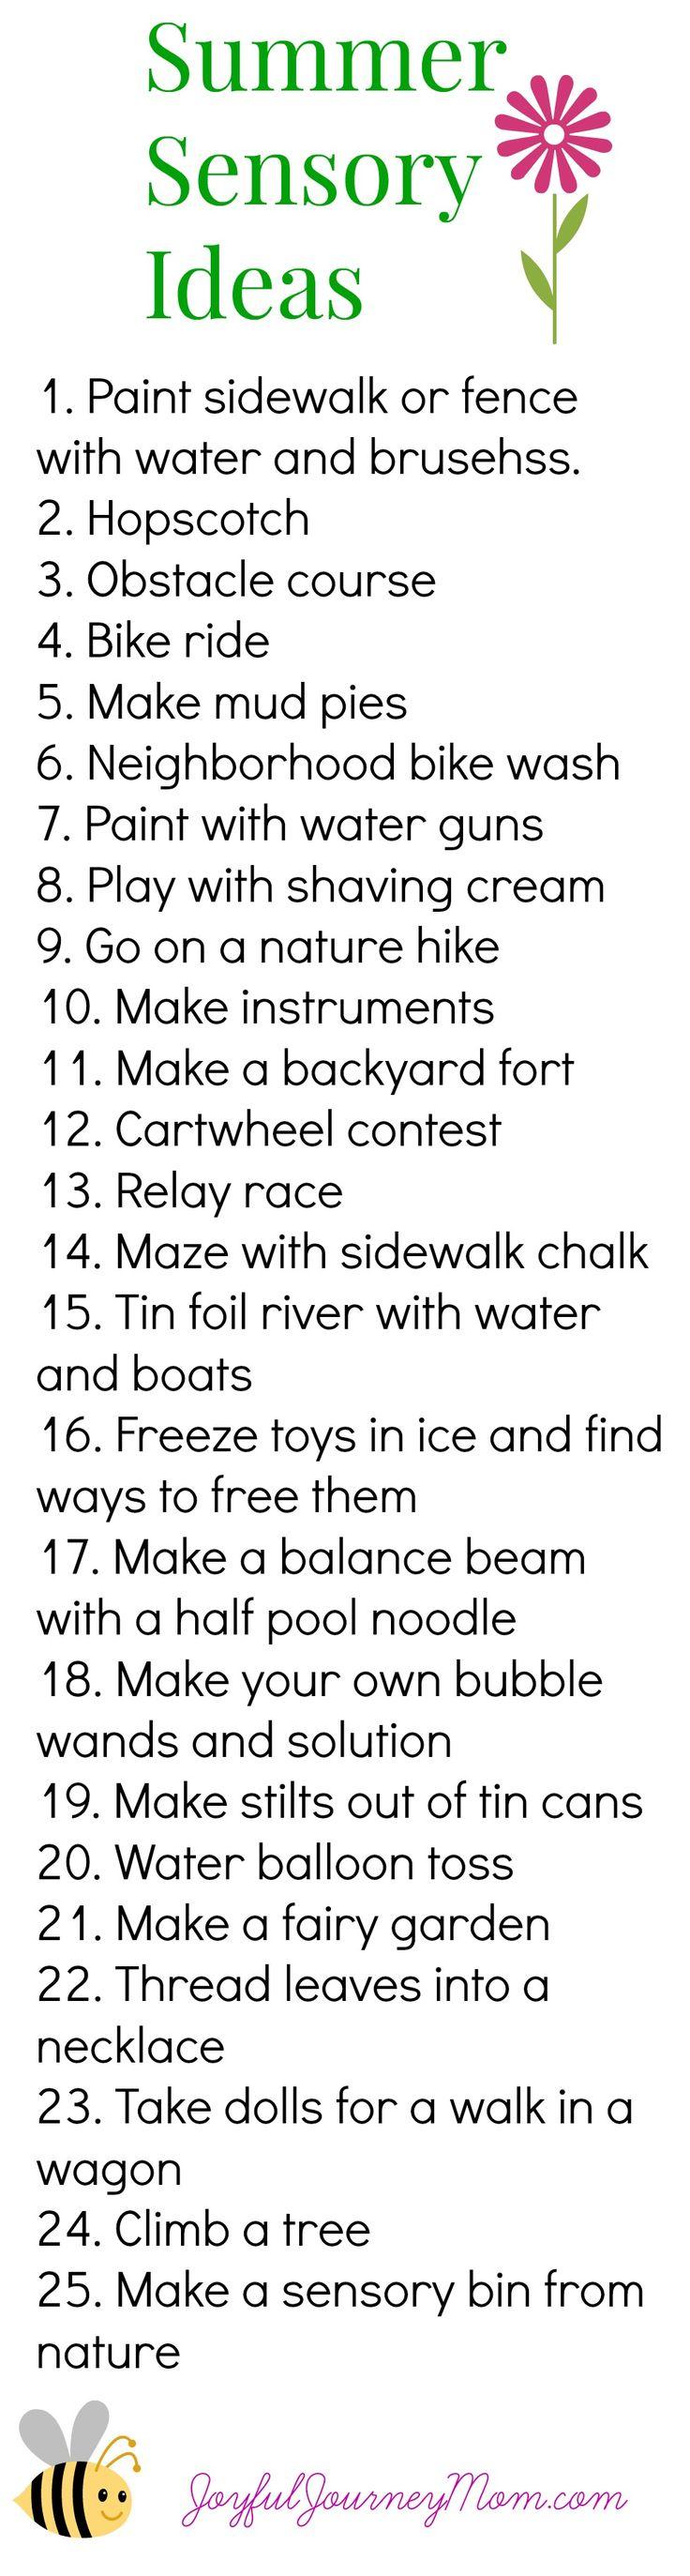 Great list of summer sensory play ideas